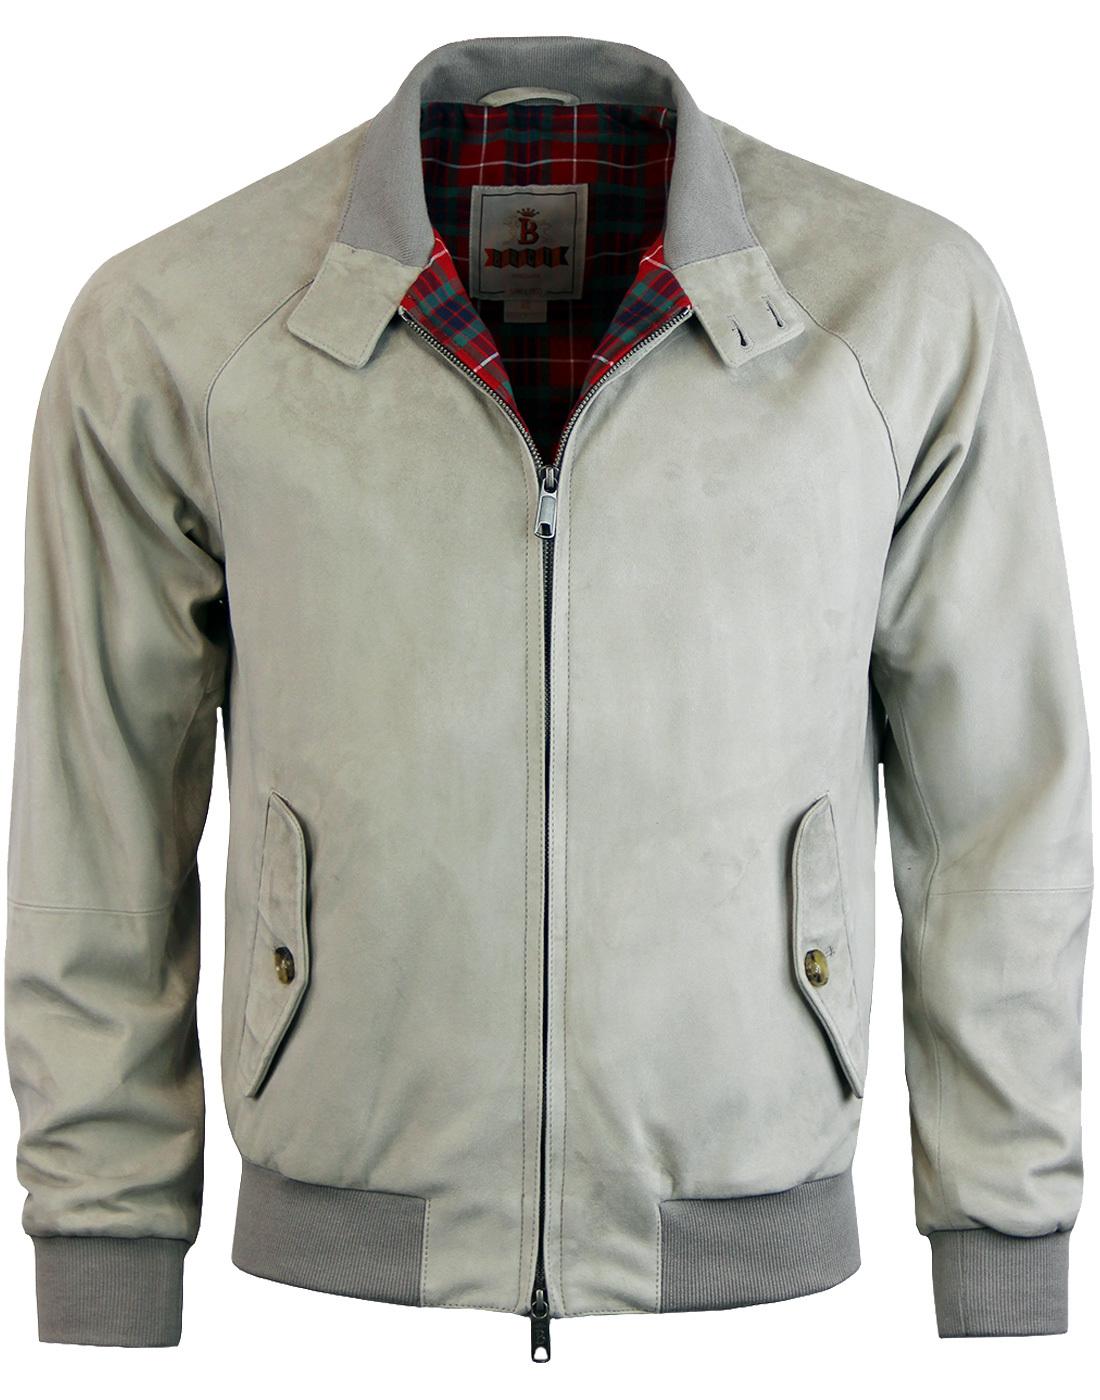 ccc5a00afeda7 BARACUTA G9 Mod 60s Suede Harrington jacket in Mist